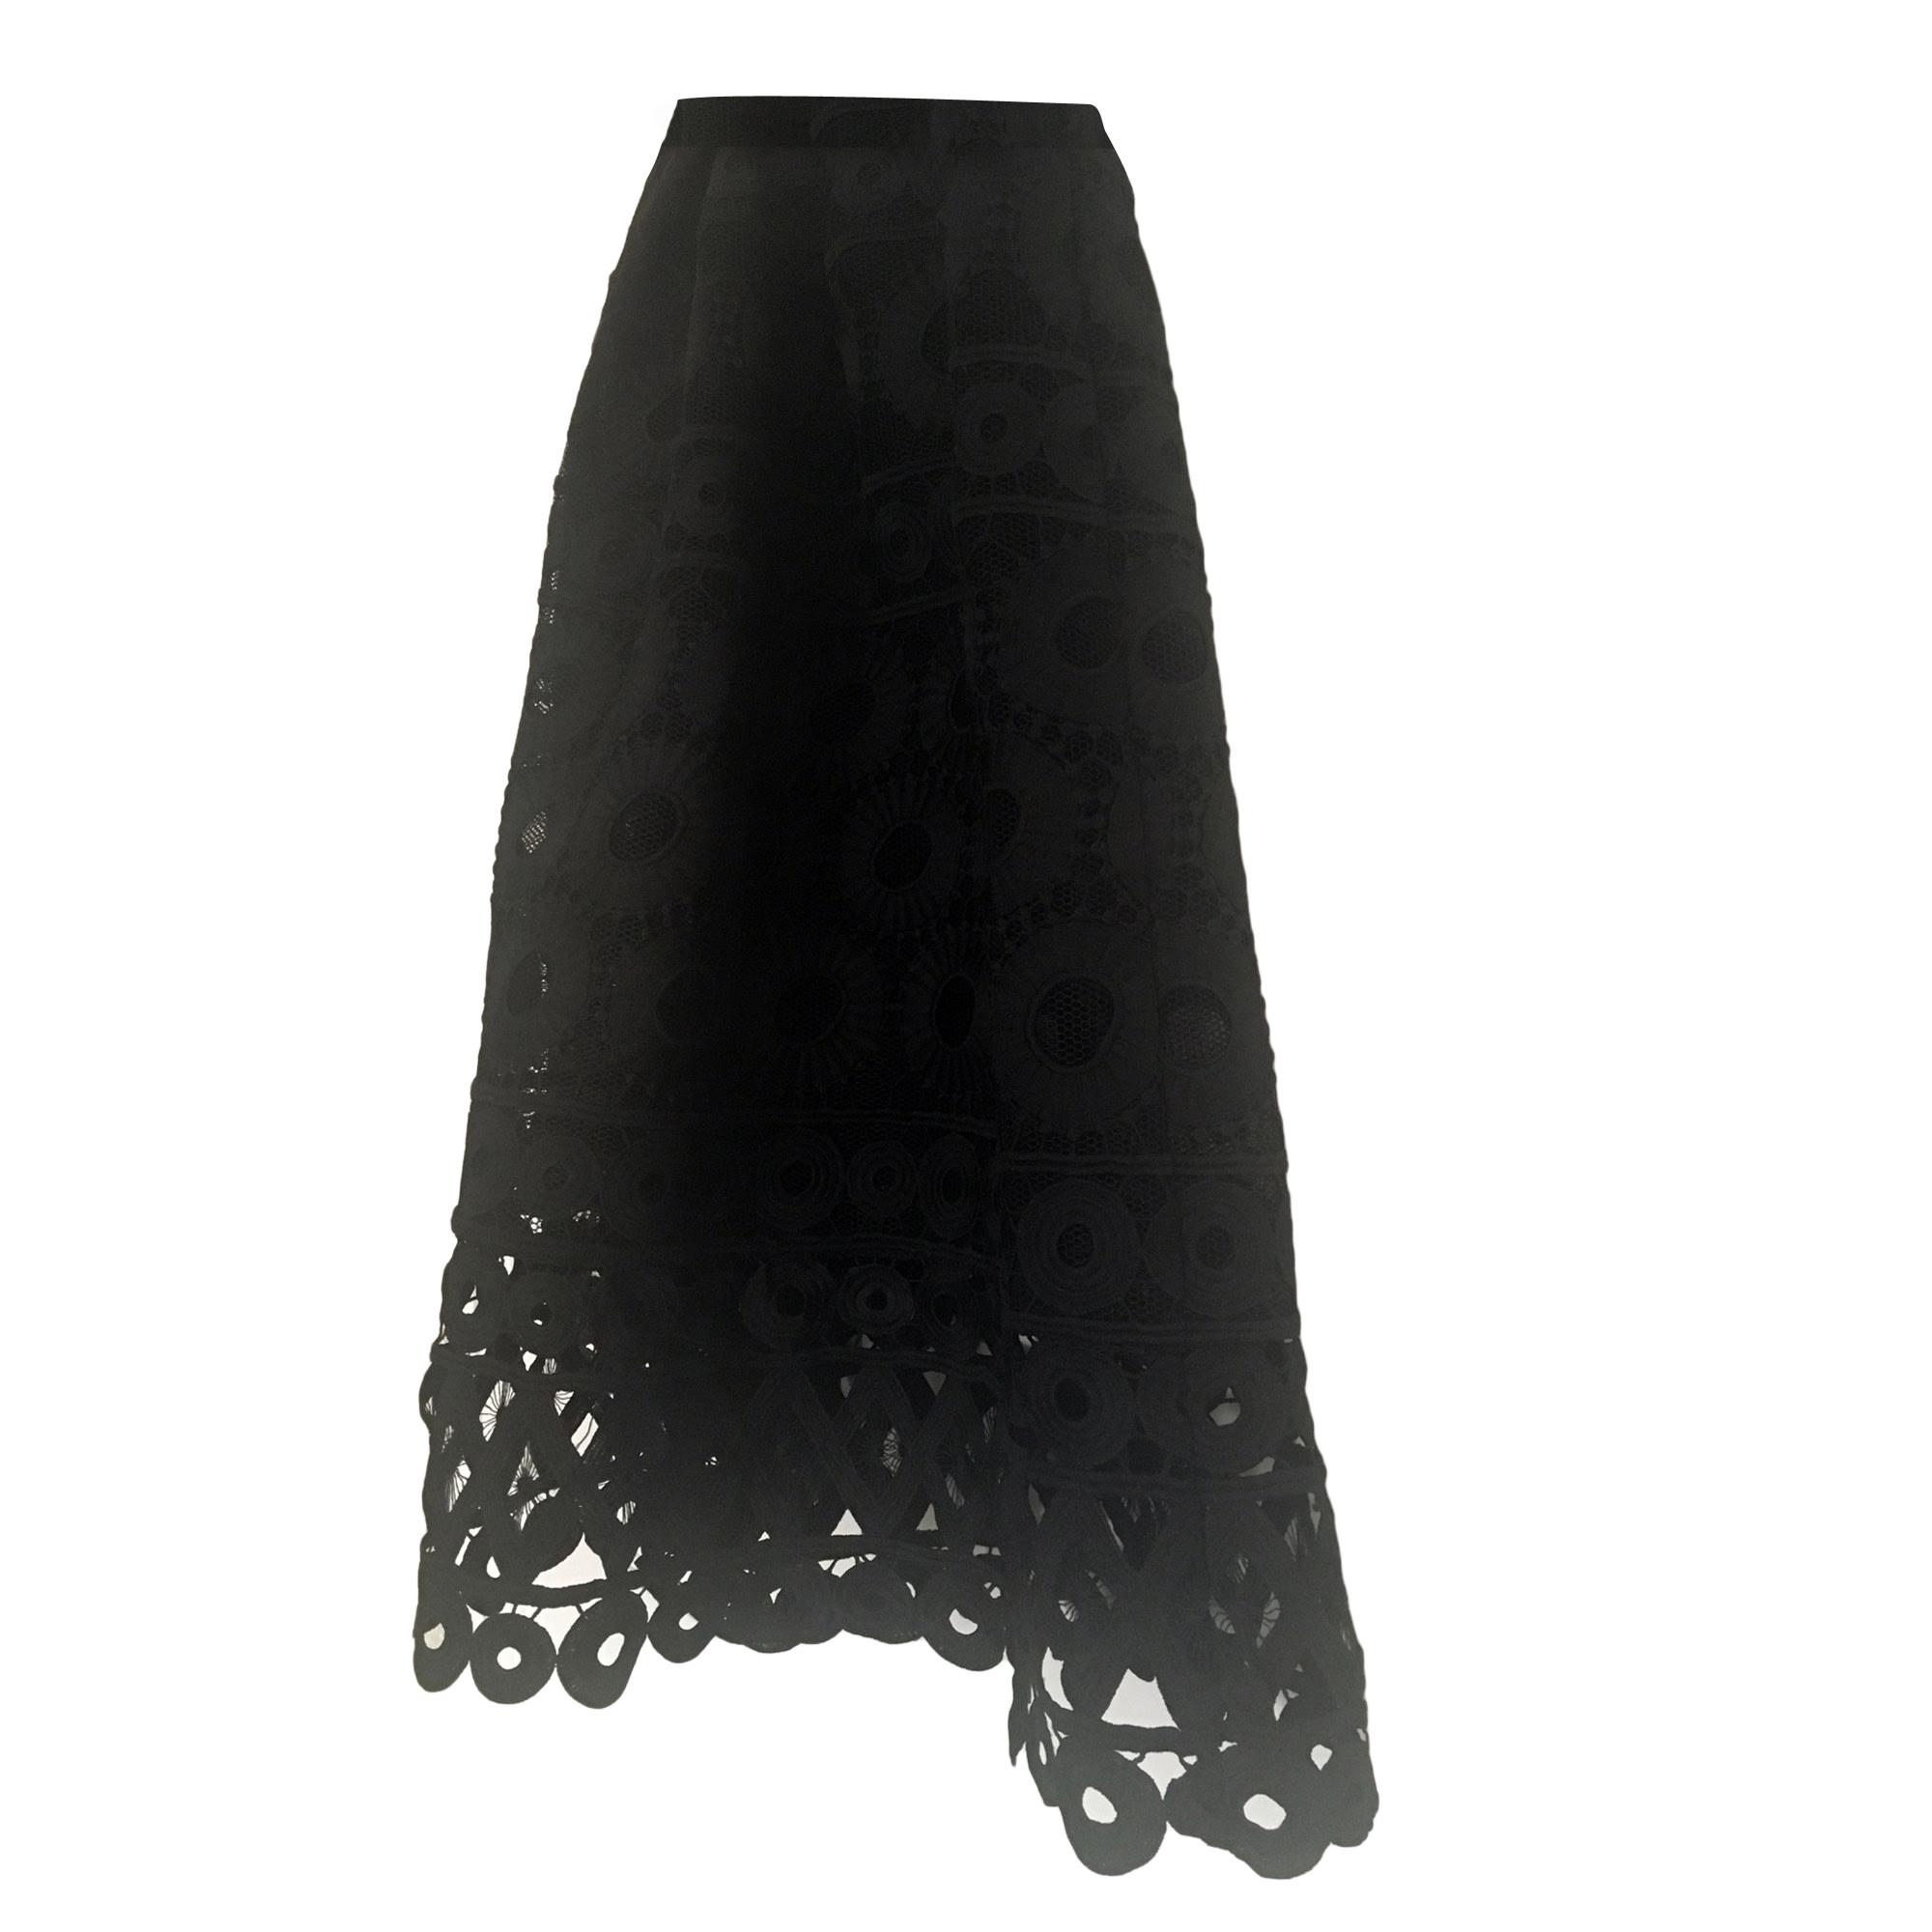 Jupe mi-longue MAJE 38 (M, T2) noir vendu par Nacera 65 - 6431710 92da9bc20953